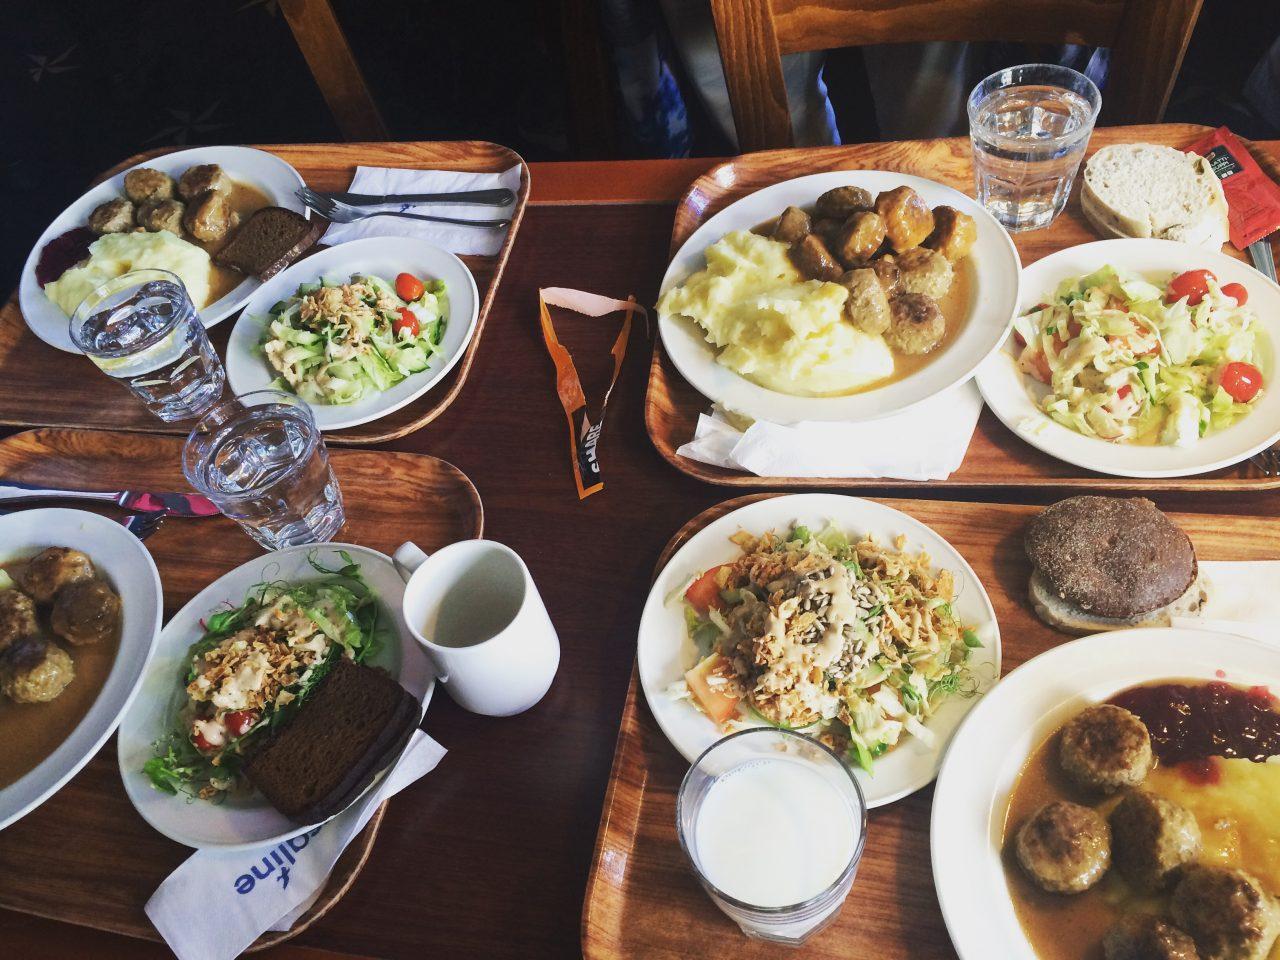 Finnish University lunch